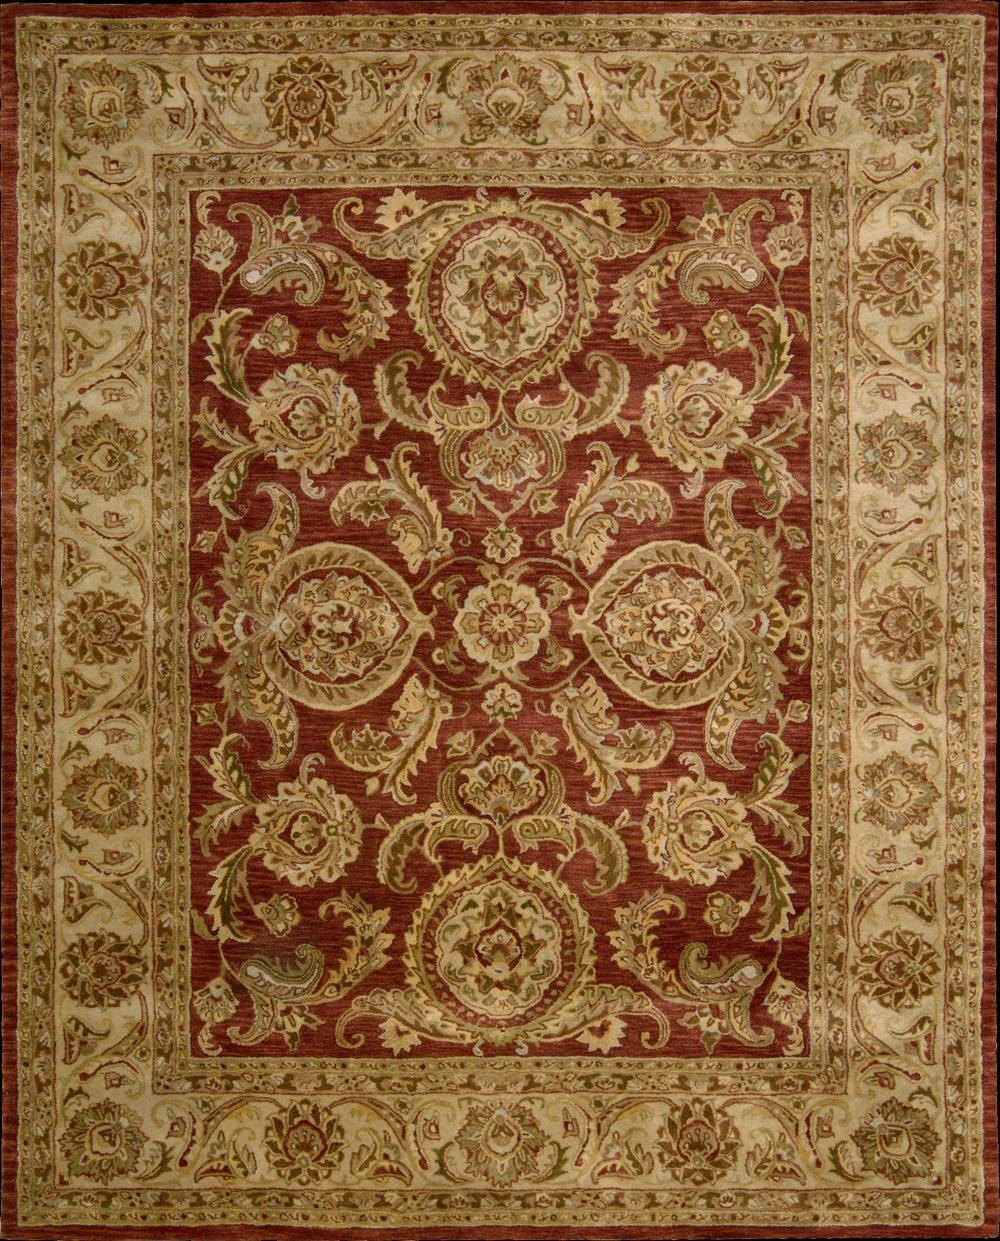 "Nourison Jaipur Area Rug 8'3"" x 11'6"" - Item Number: 2173"